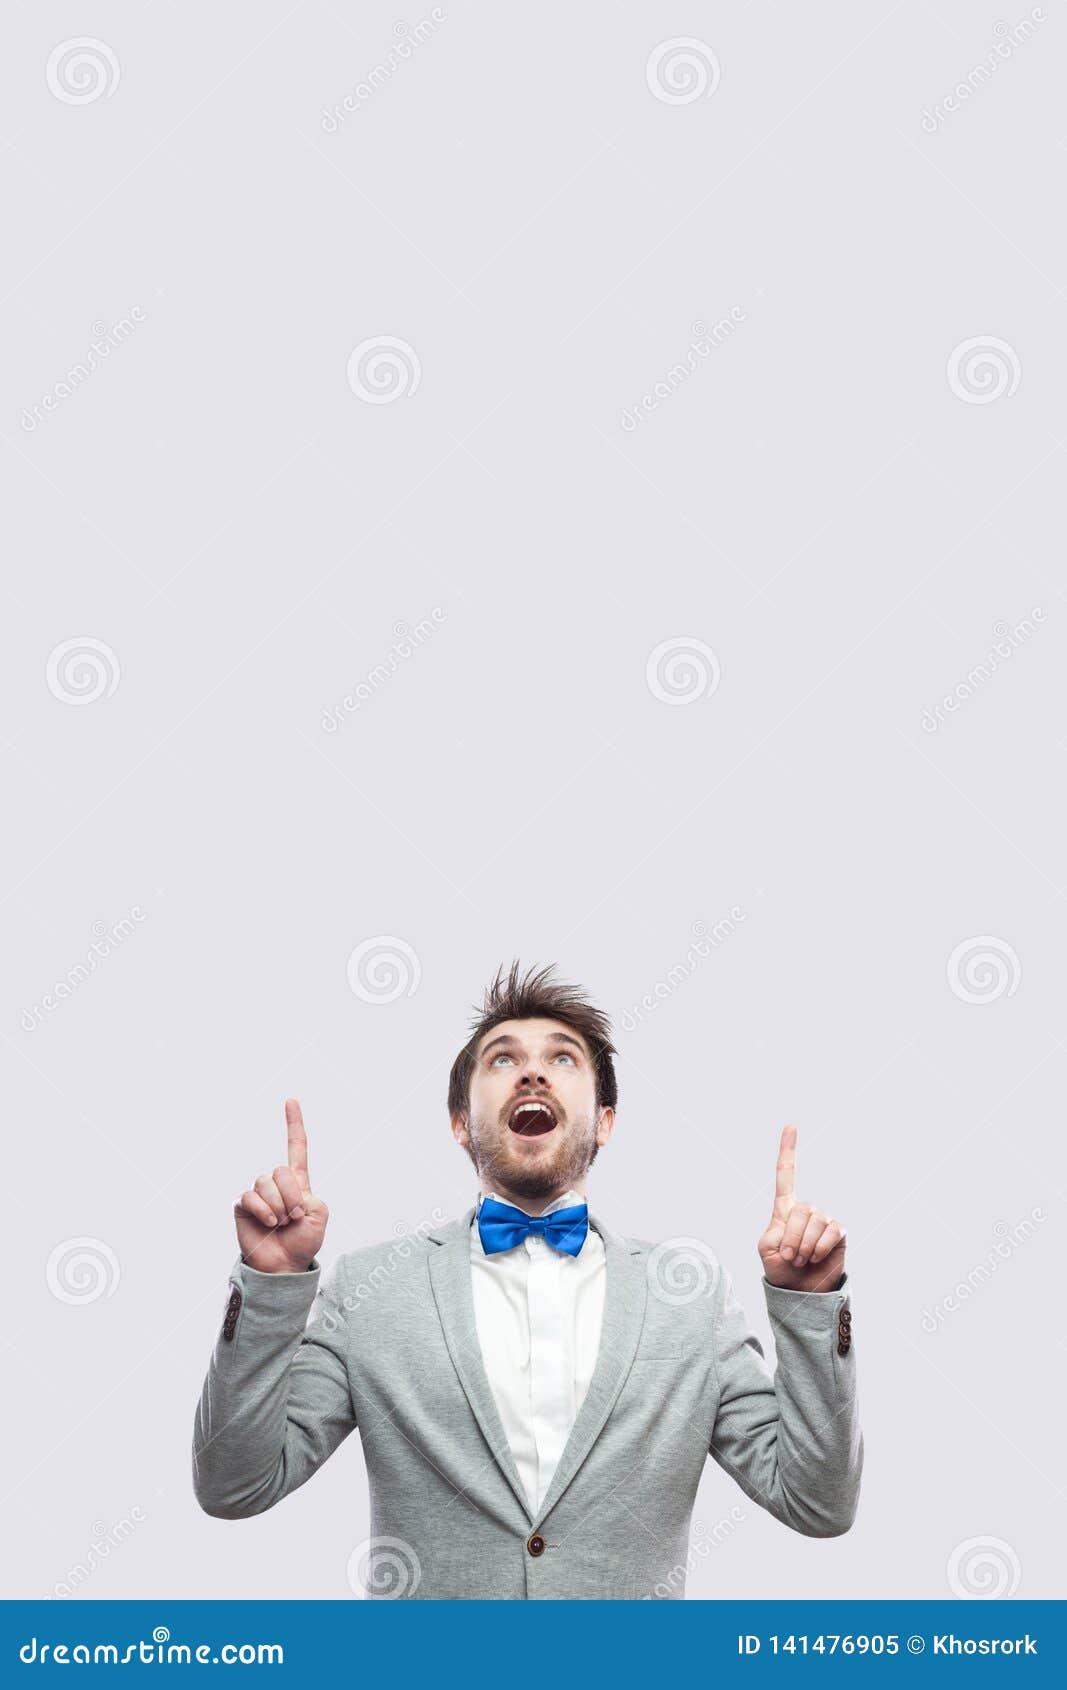 Portret van de verbaasde knappe gebaarde mens in toevallig grijs kostuum en blauwe vlinderdas status bekijkend en richtend op omh